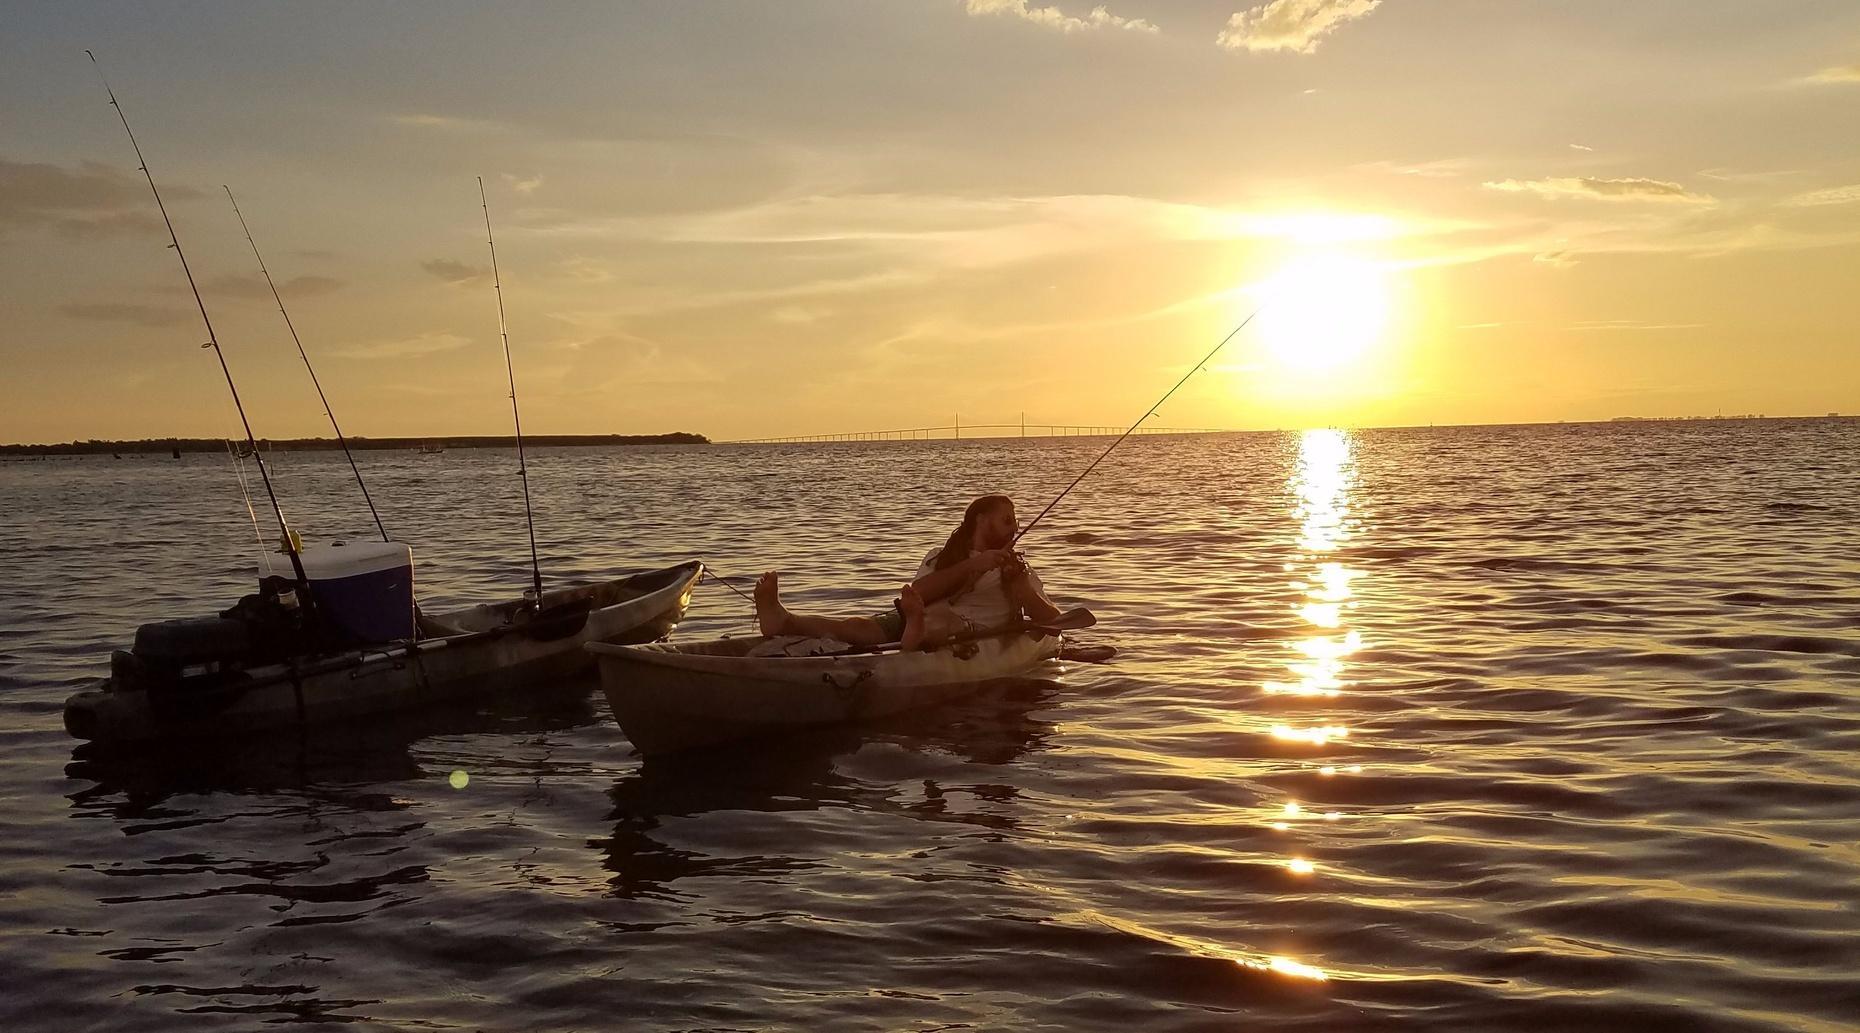 Shell Key Preserve Guided Kayaking Tour